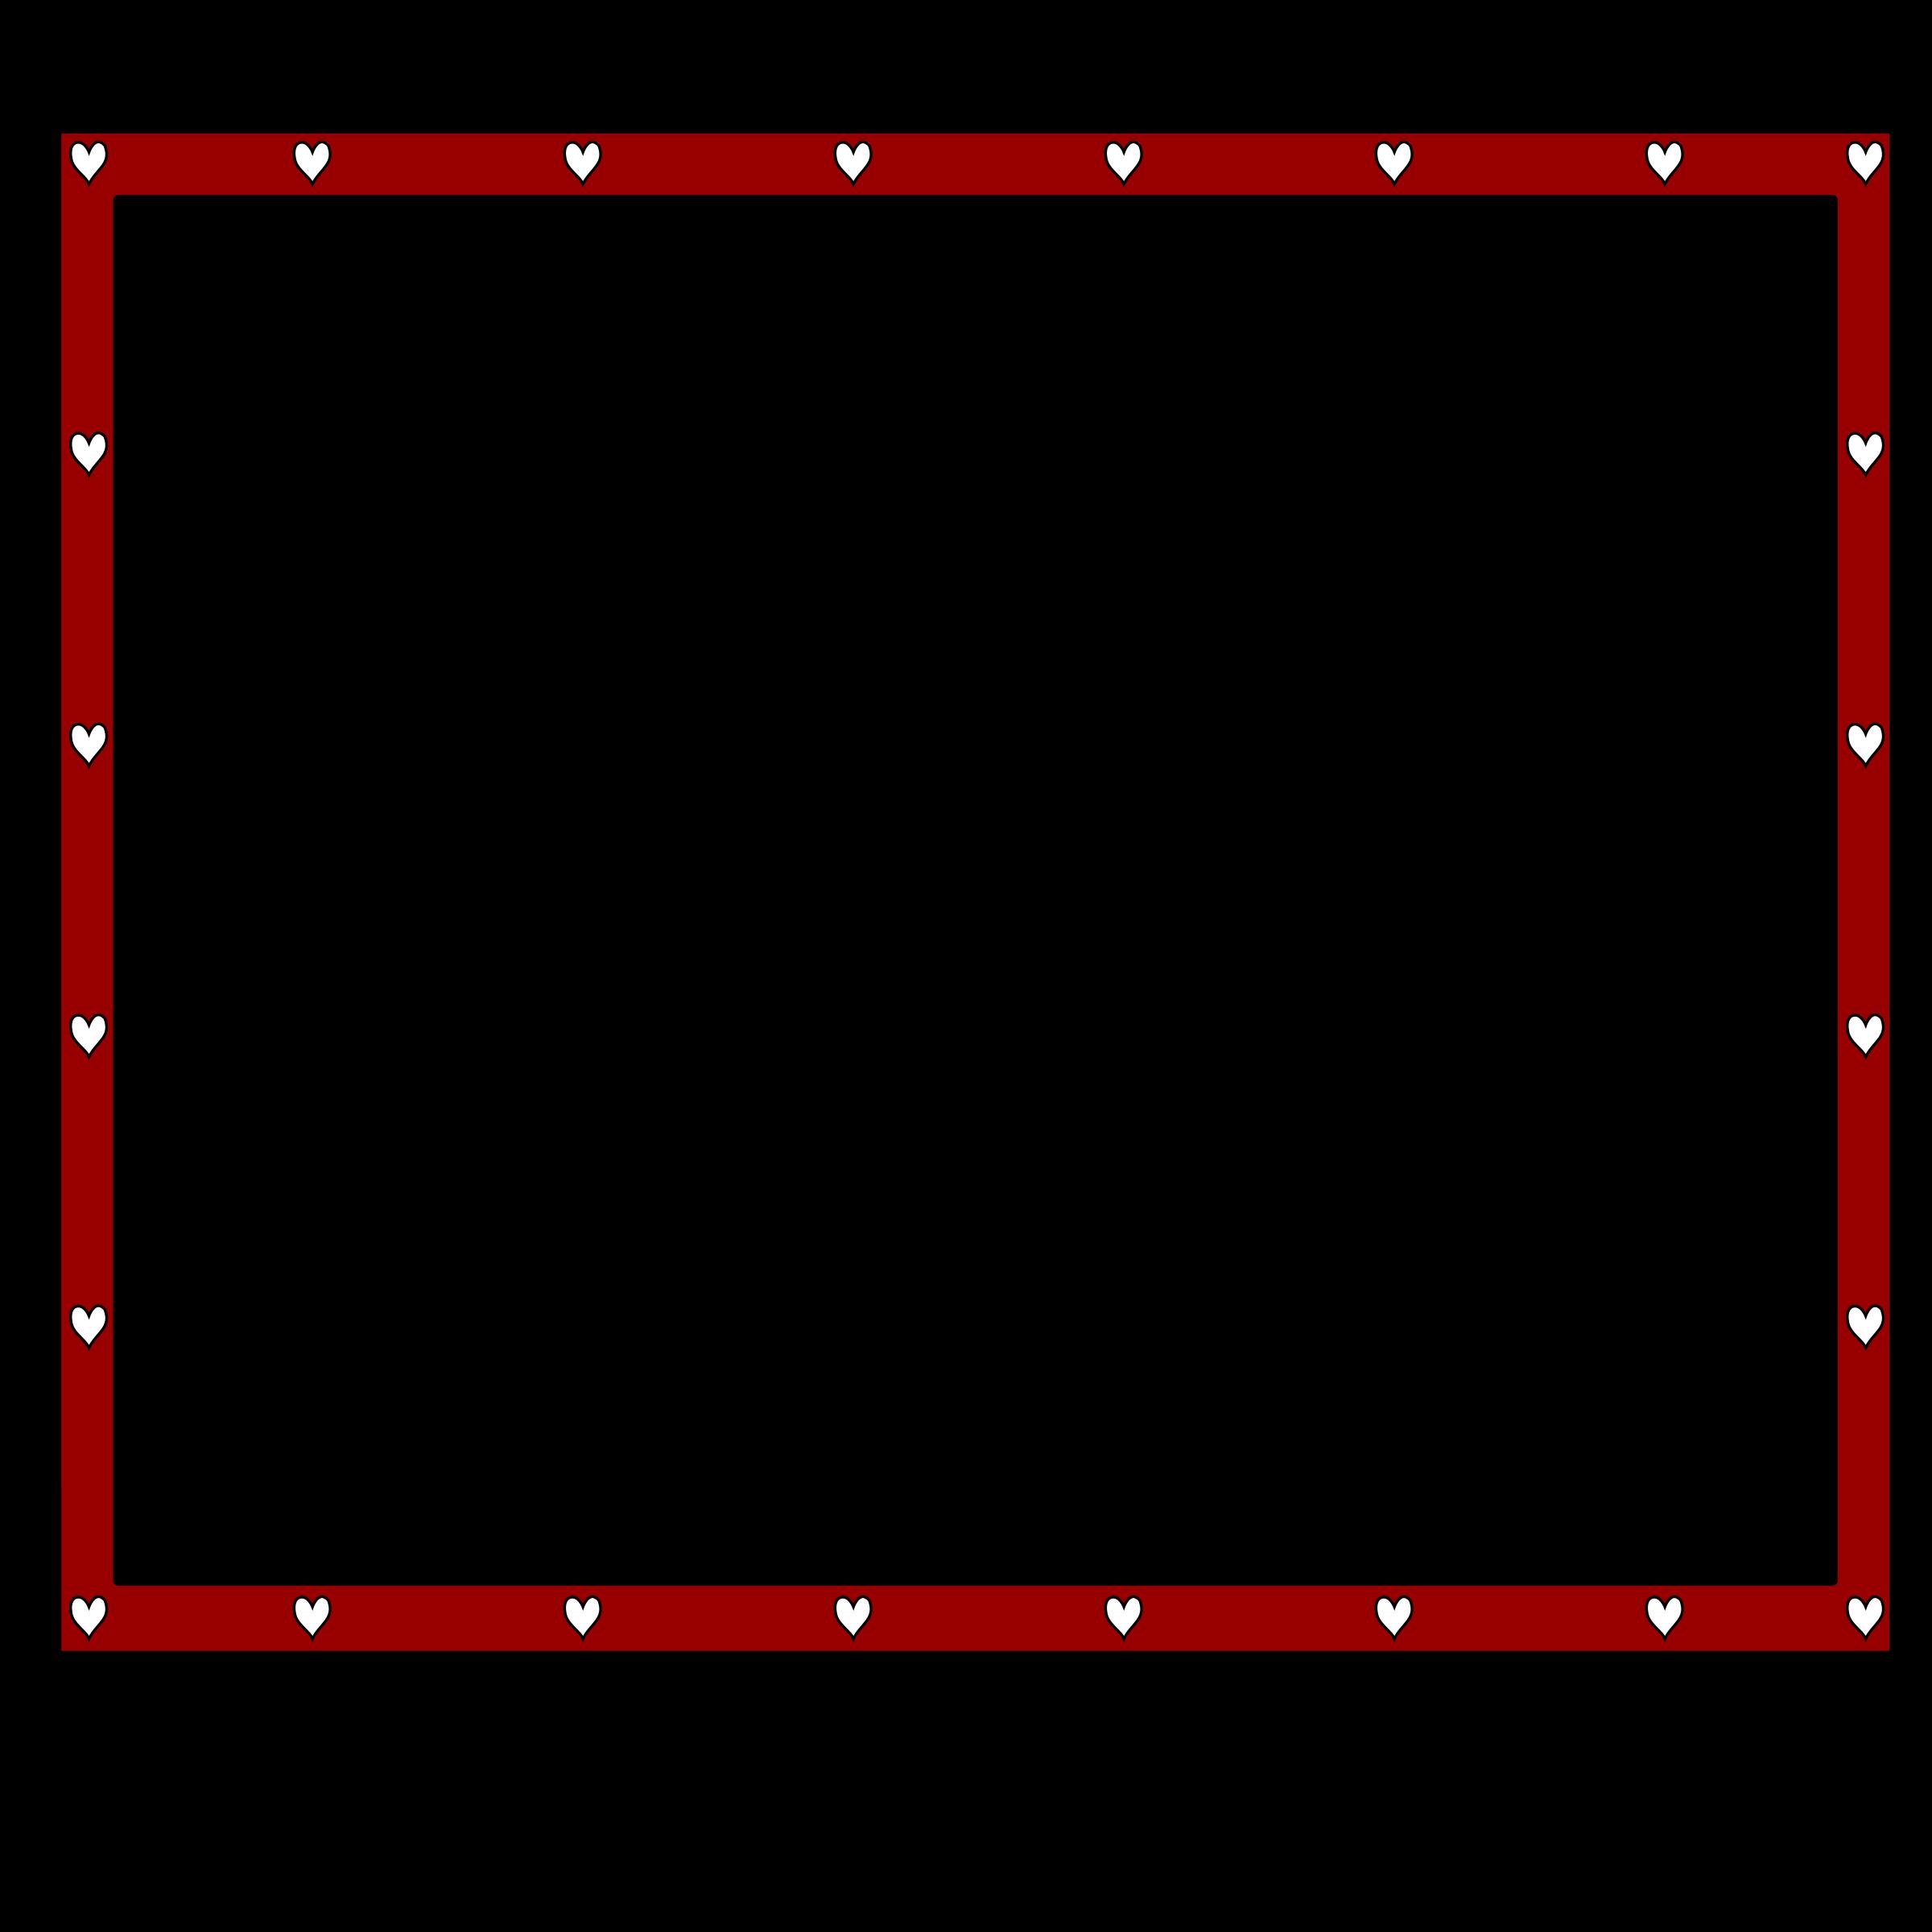 Maroon clipart frame RedBlack hearts4x3 hearts4x3 border redBlack